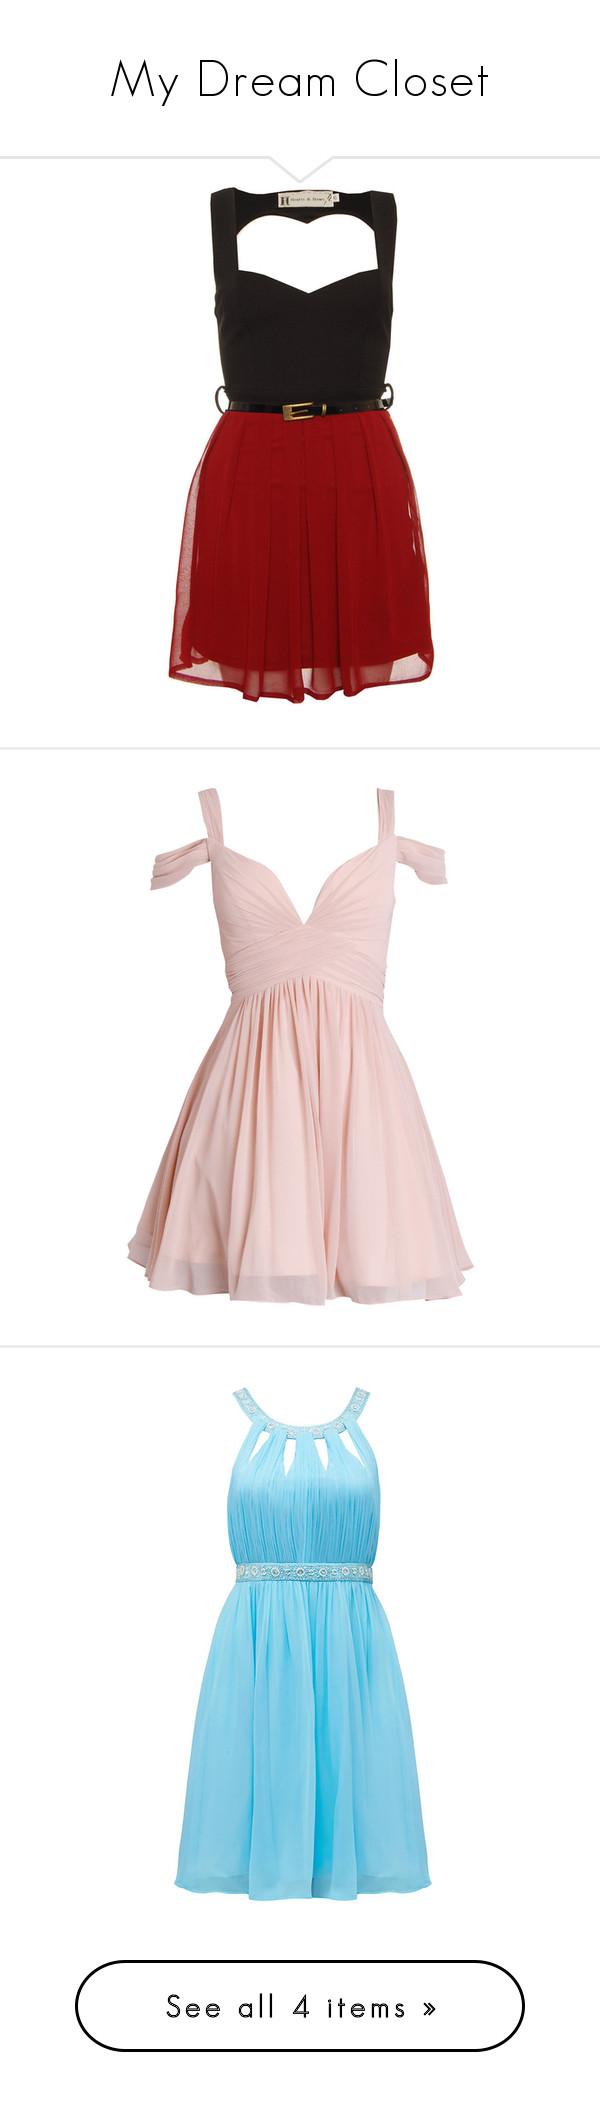 """My Dream Closet"" by sealy913 ❤ liked on Polyvore featuring dresses, vestidos, short dresses, robe, wine dress, mini dress, pink, chiffon dresses, white mini dress and short prom dresses"